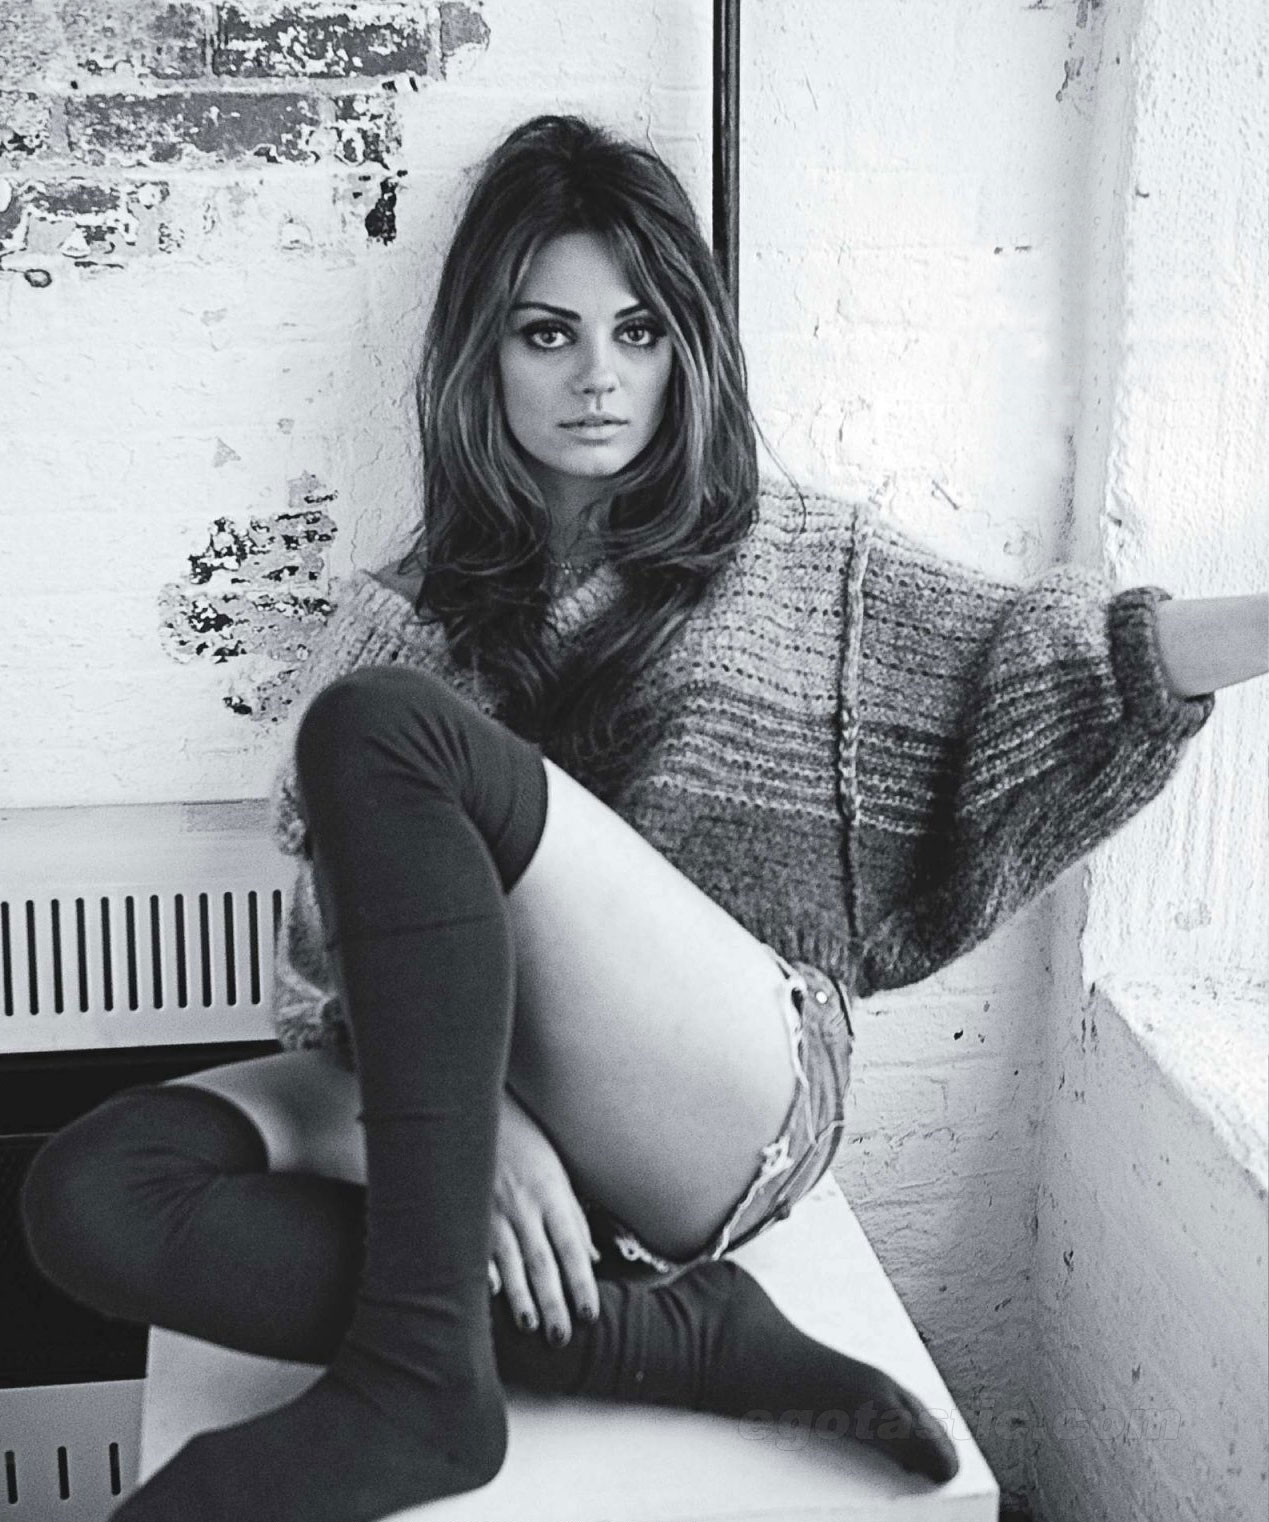 Mila Kunis Photoshoot For Nylon Magazine Is Hot in Black and White